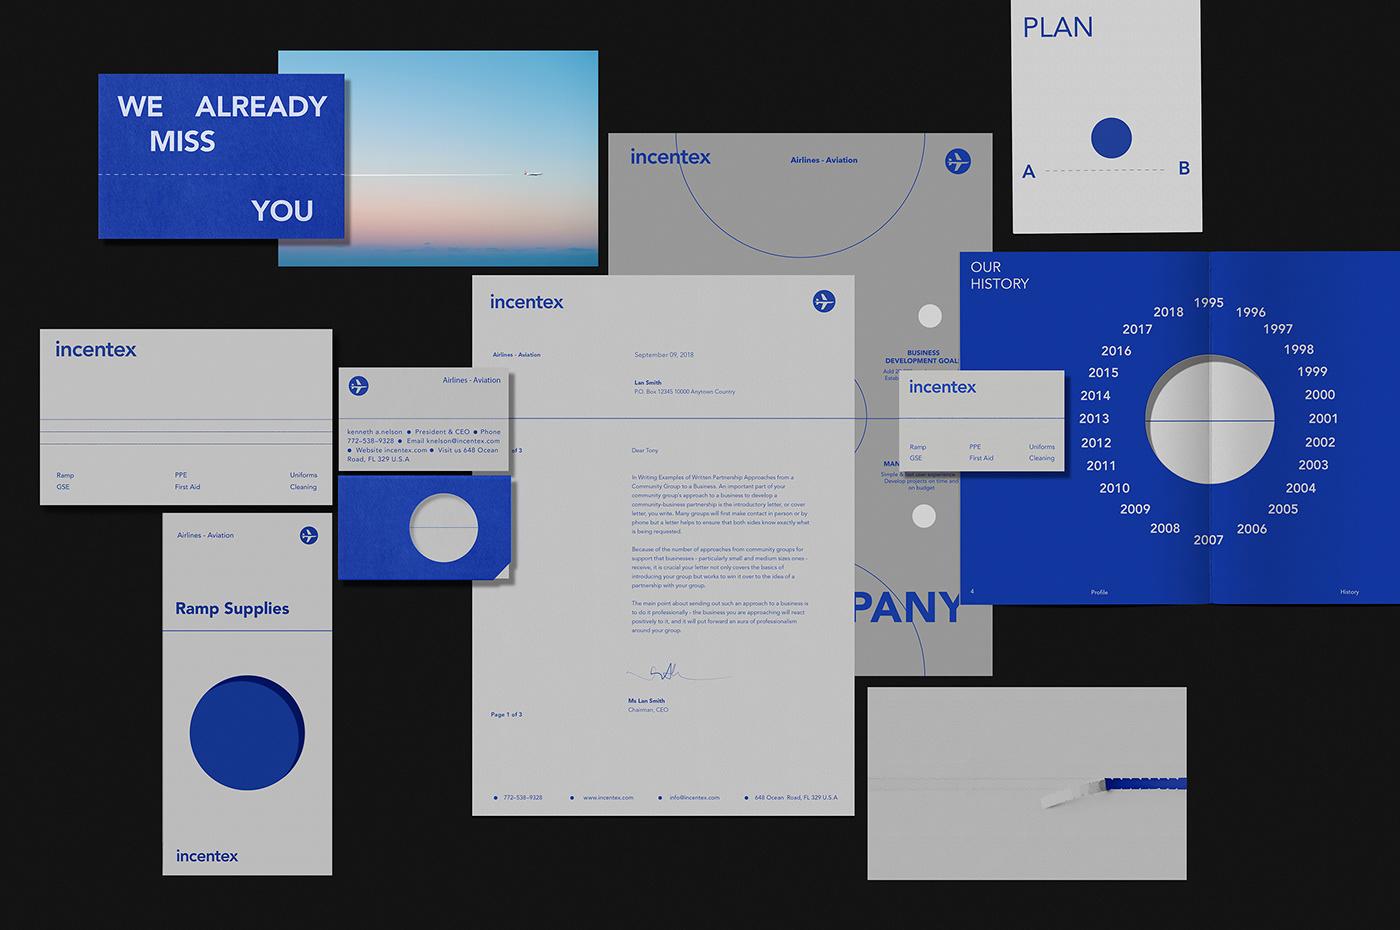 vietnam vietnam graphic designer logo designer vietnam bratus bratus agency Corporate Identity visual identity logo jimmituan brand poster